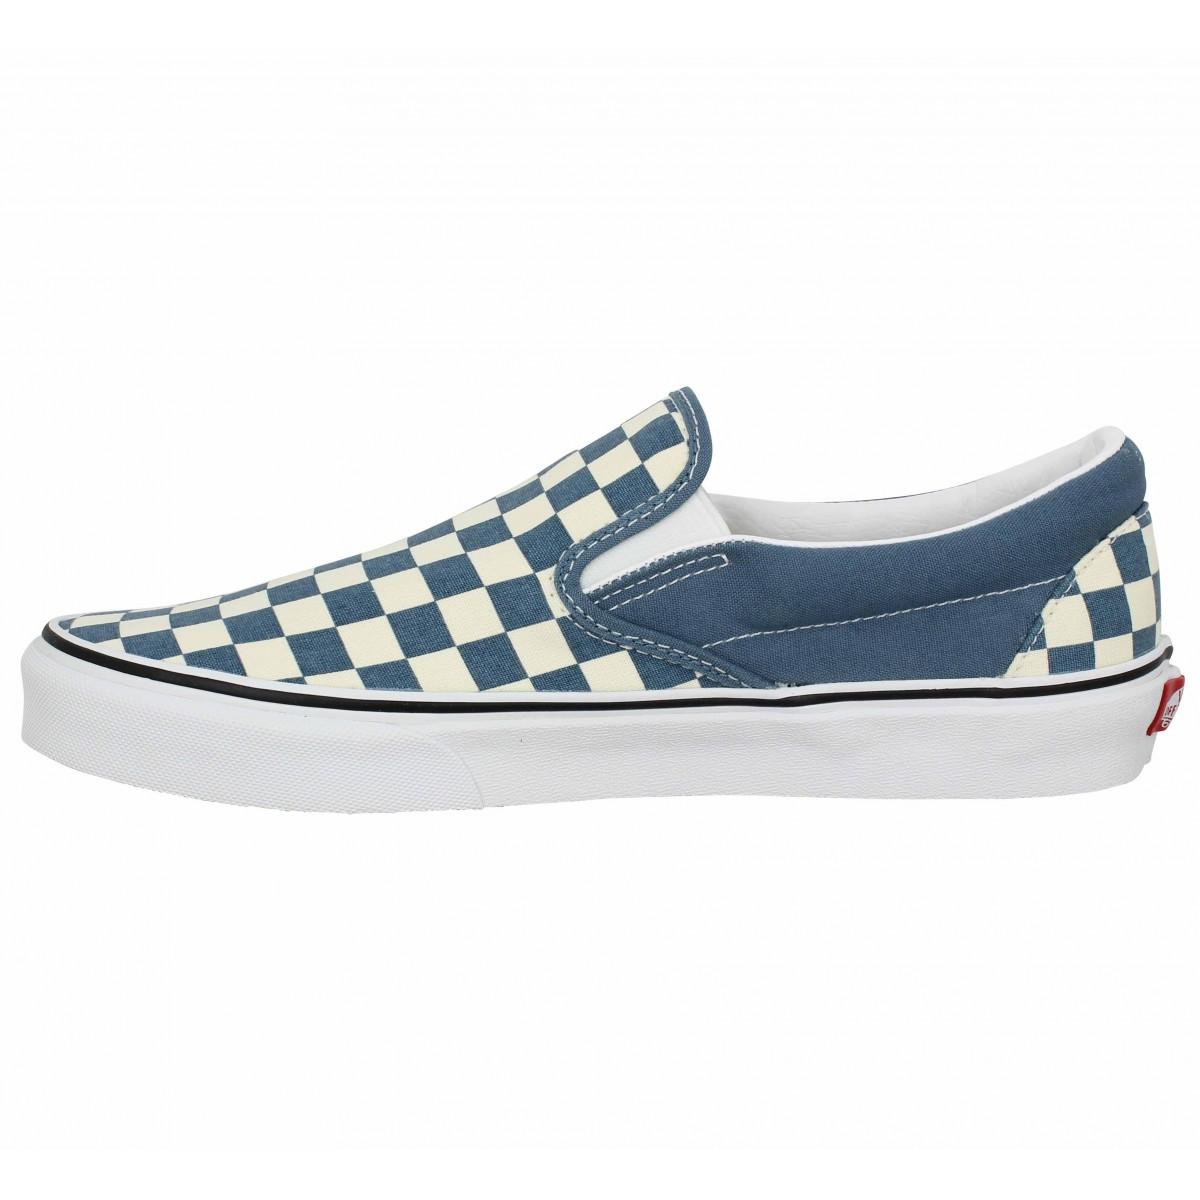 Vans classic slip on toile homme damier blue homme | Fanny chaussures